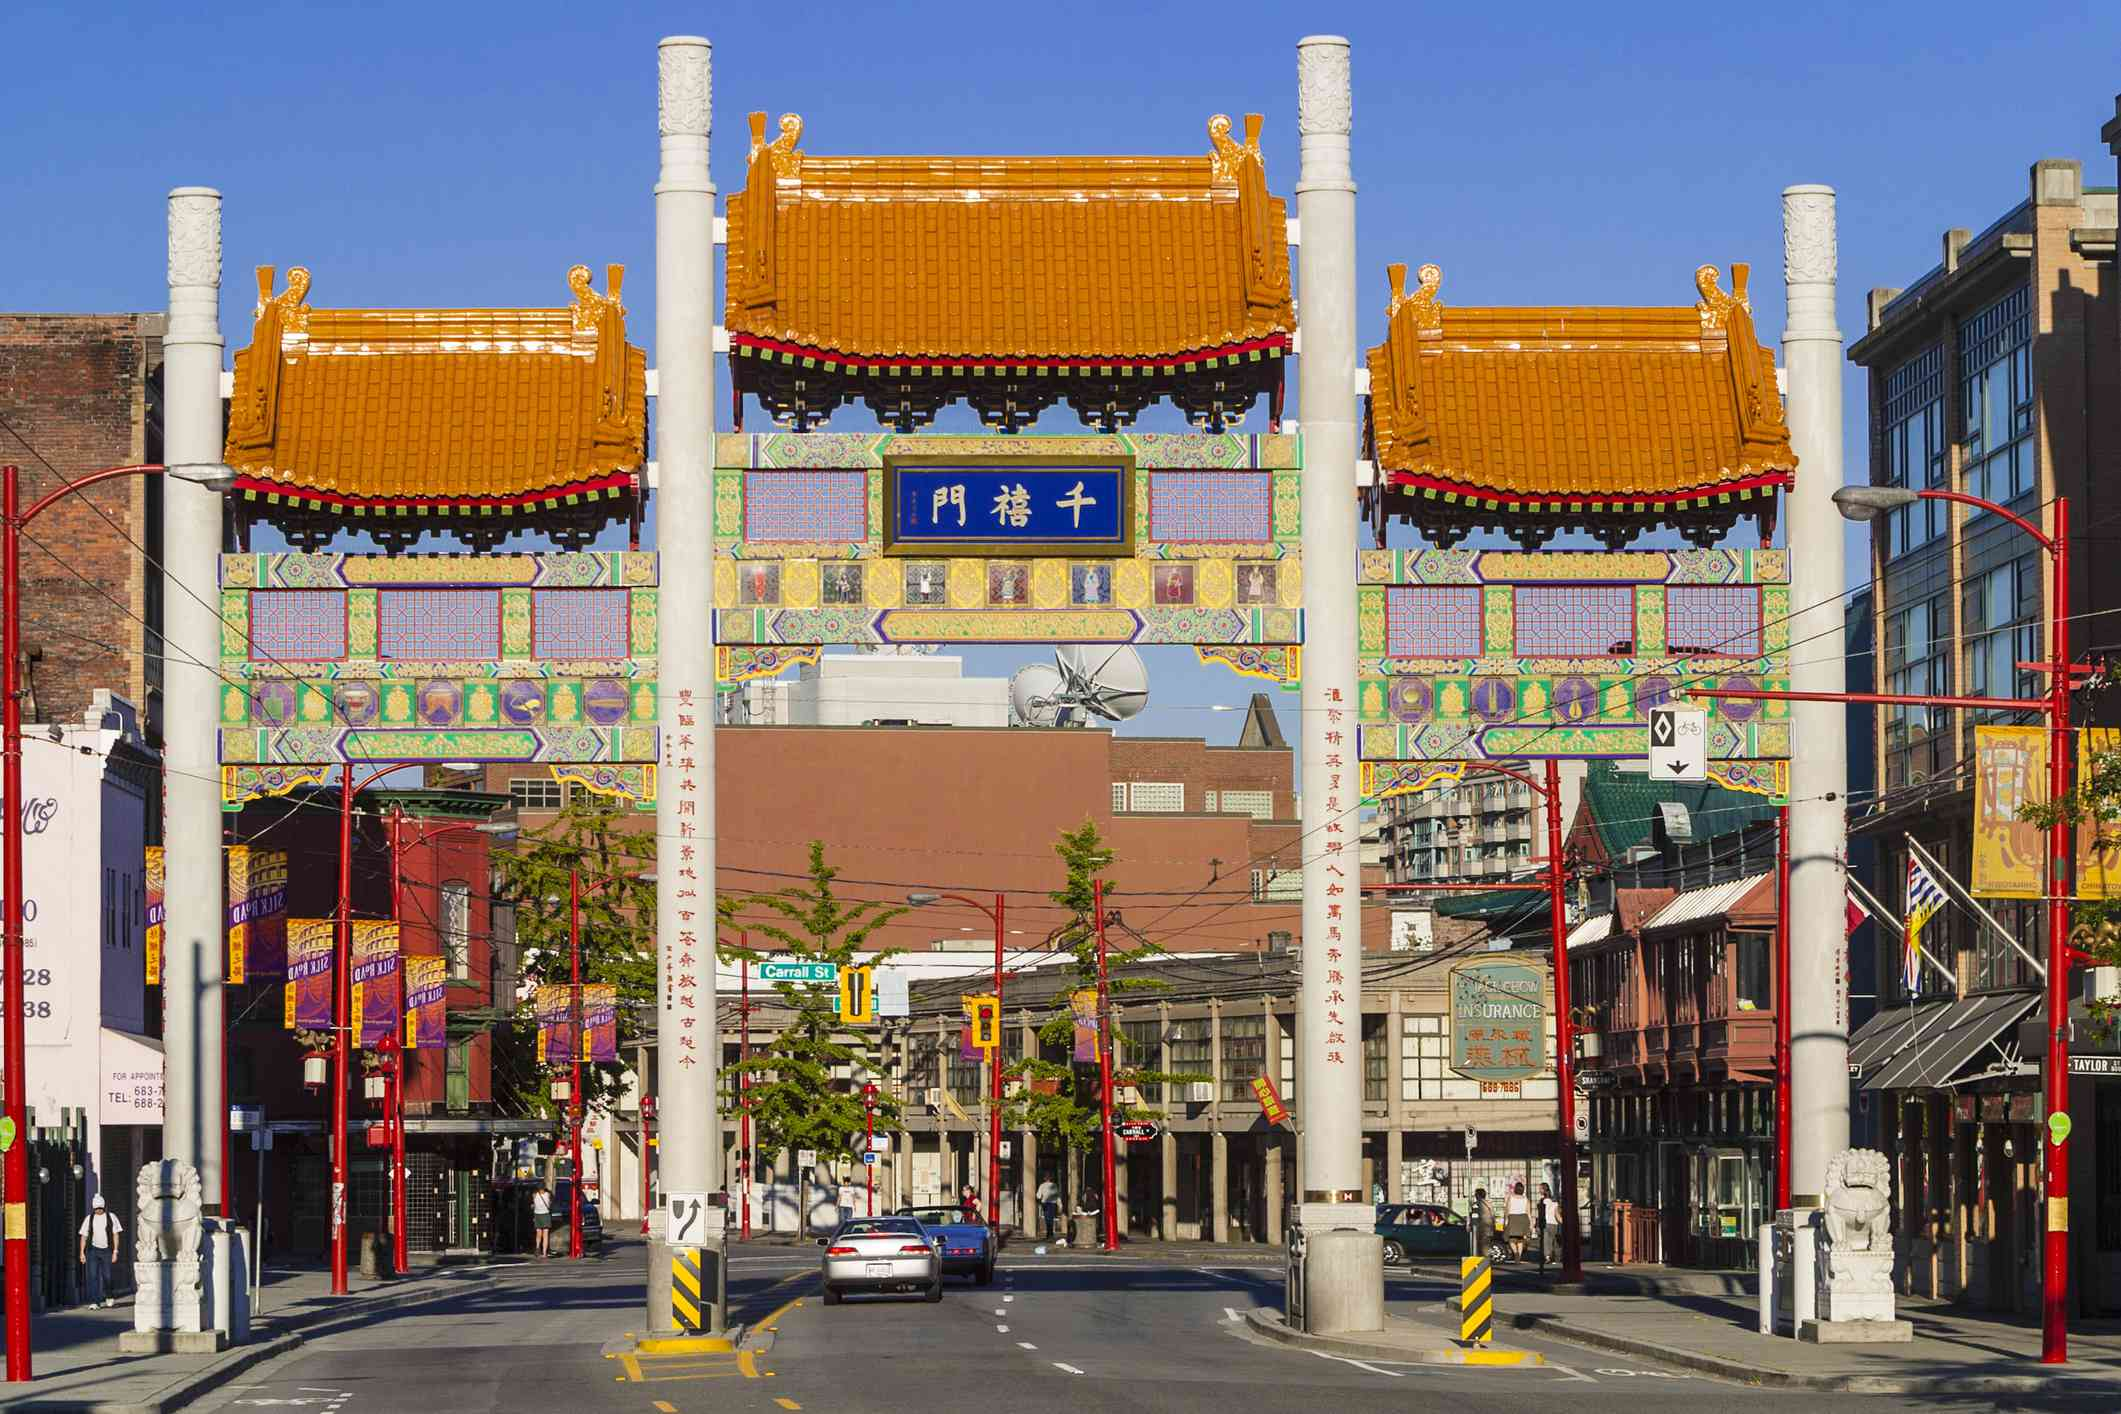 Chinatown Millenium Gate, Vancouver